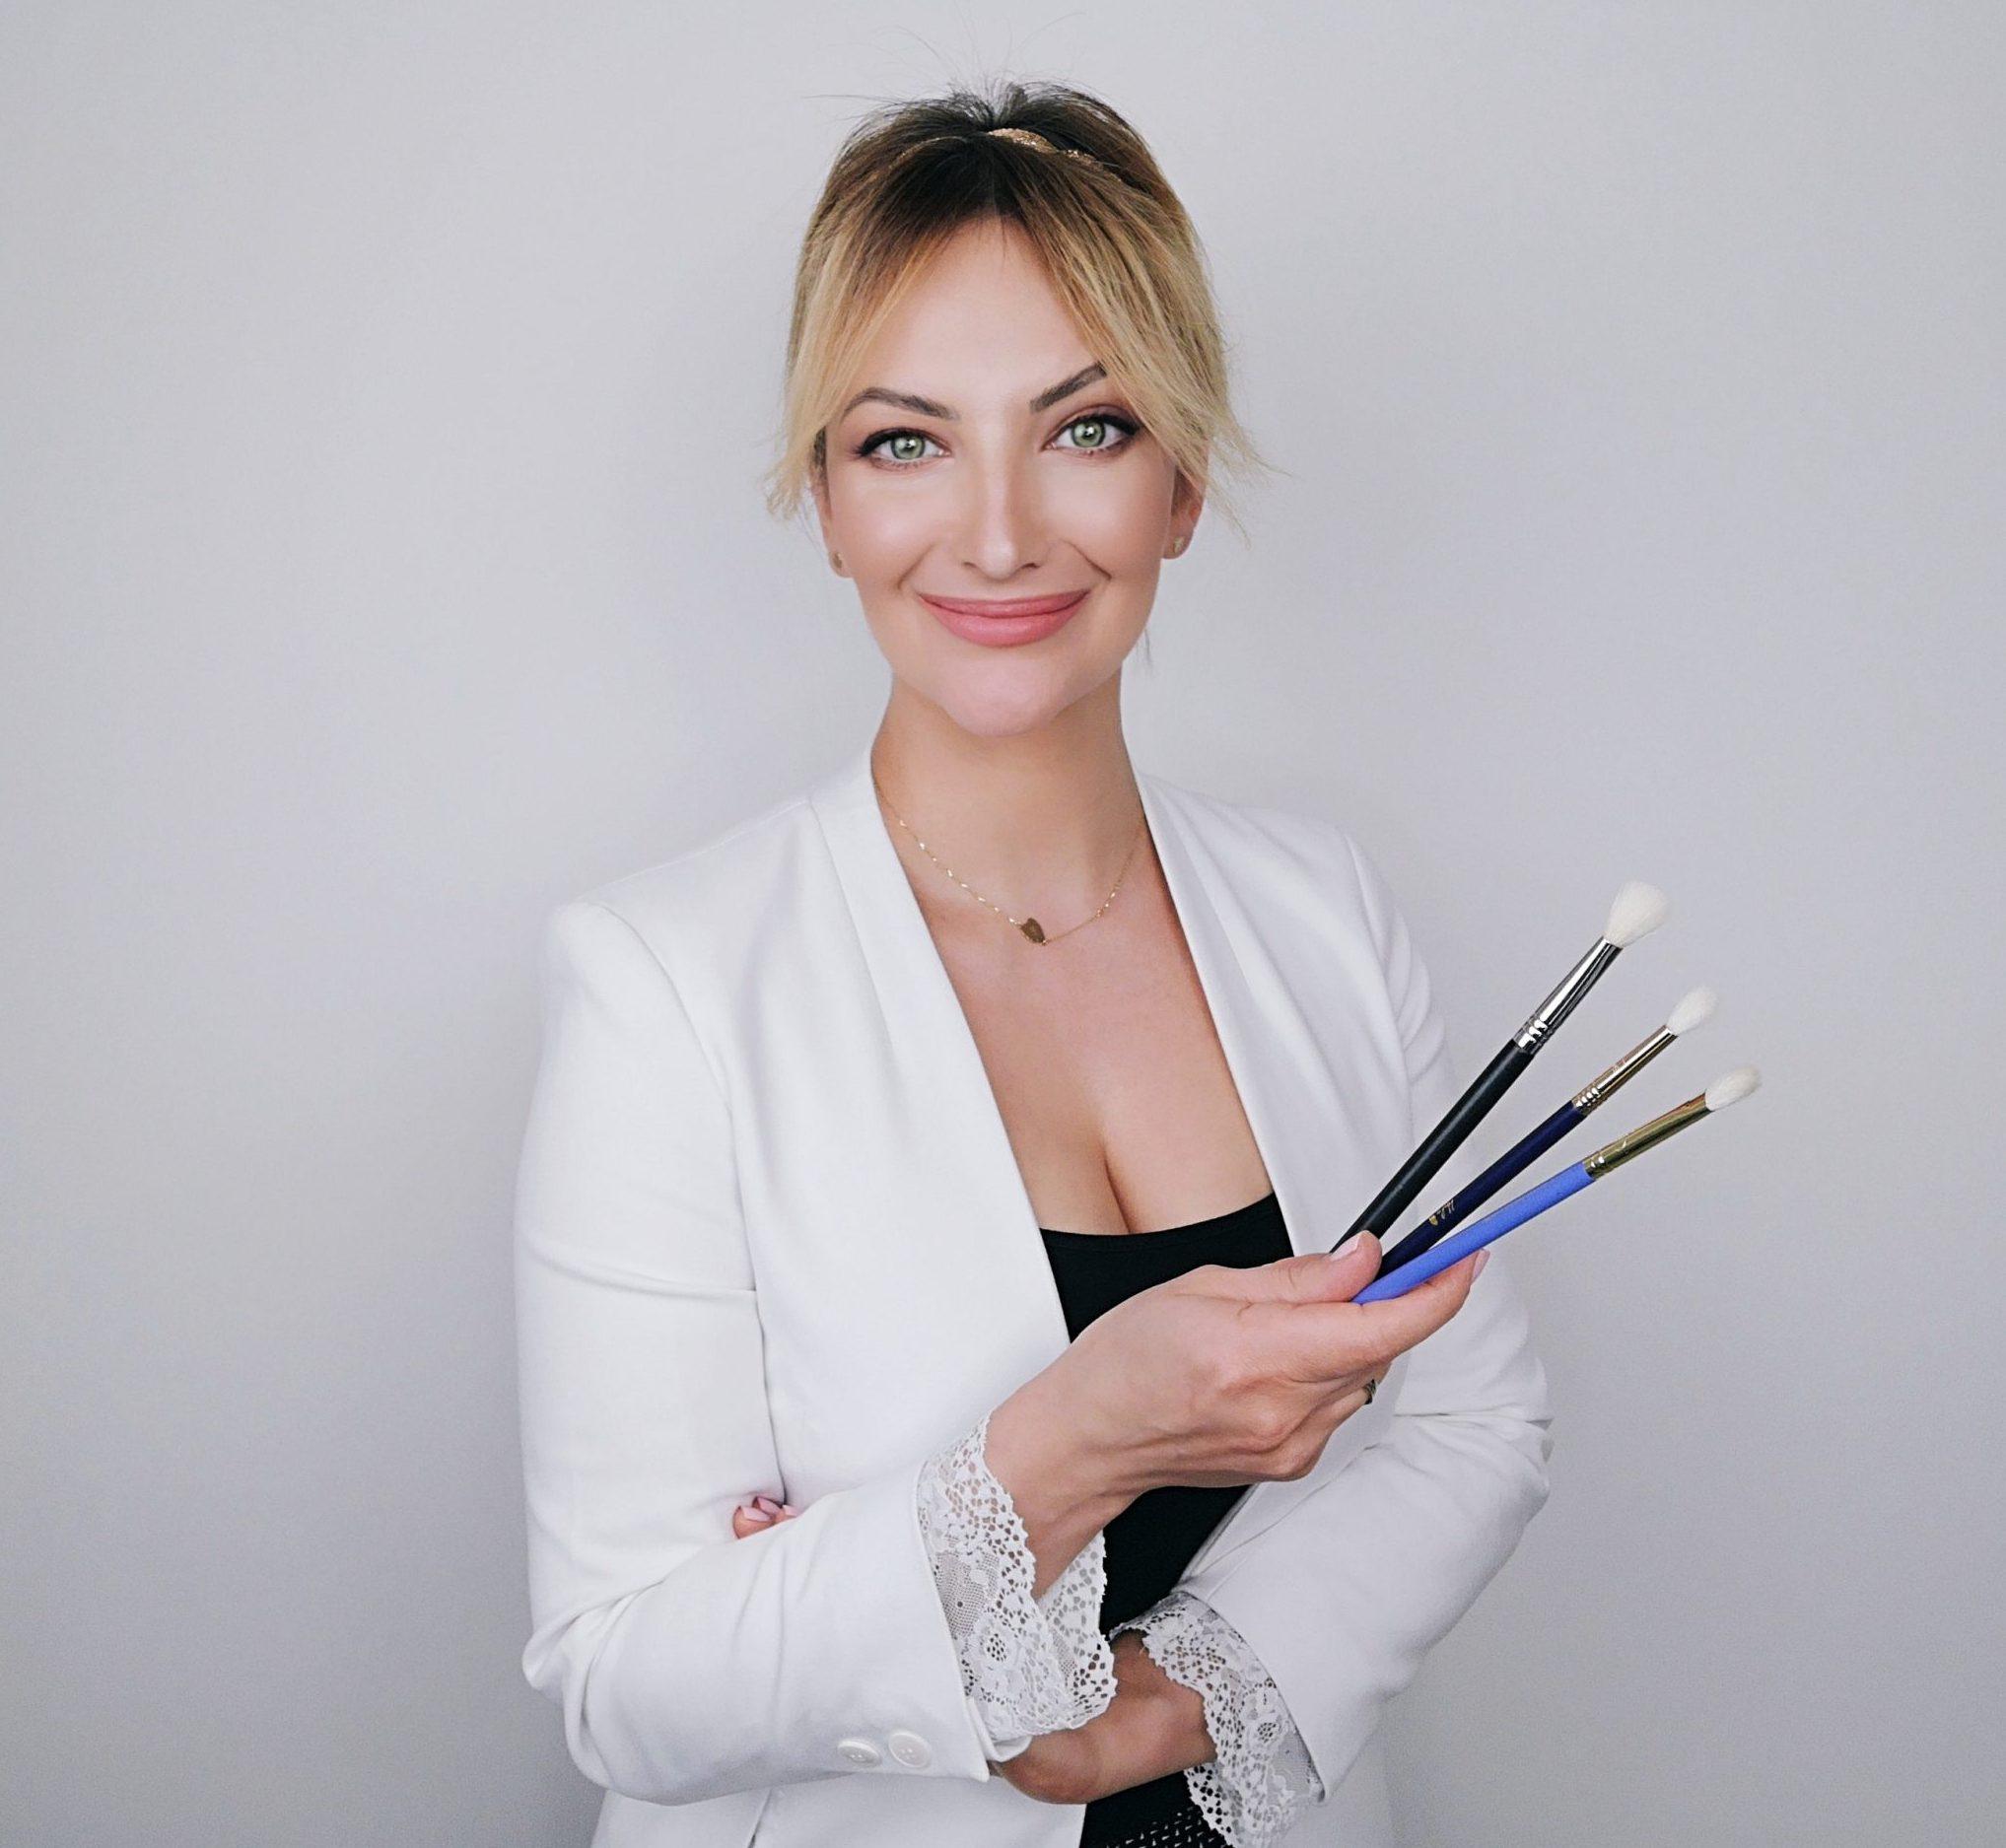 Joanna Dejneka